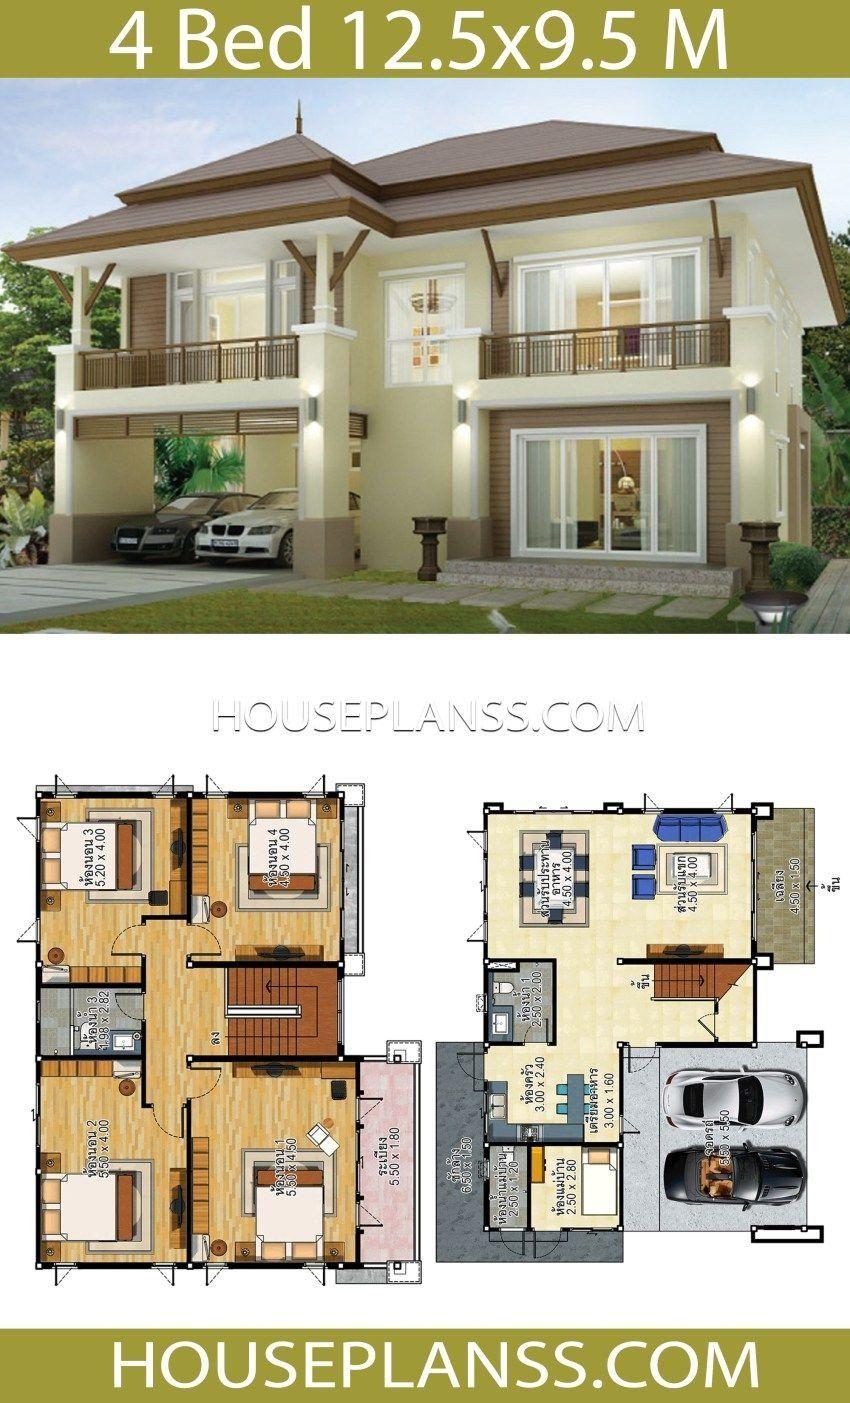 Modern House Designs Double Floor House Design Idea 12 5x9 5 With 4 Bedrooms In 2020 Modern House Design Home Building Design Model House Plan